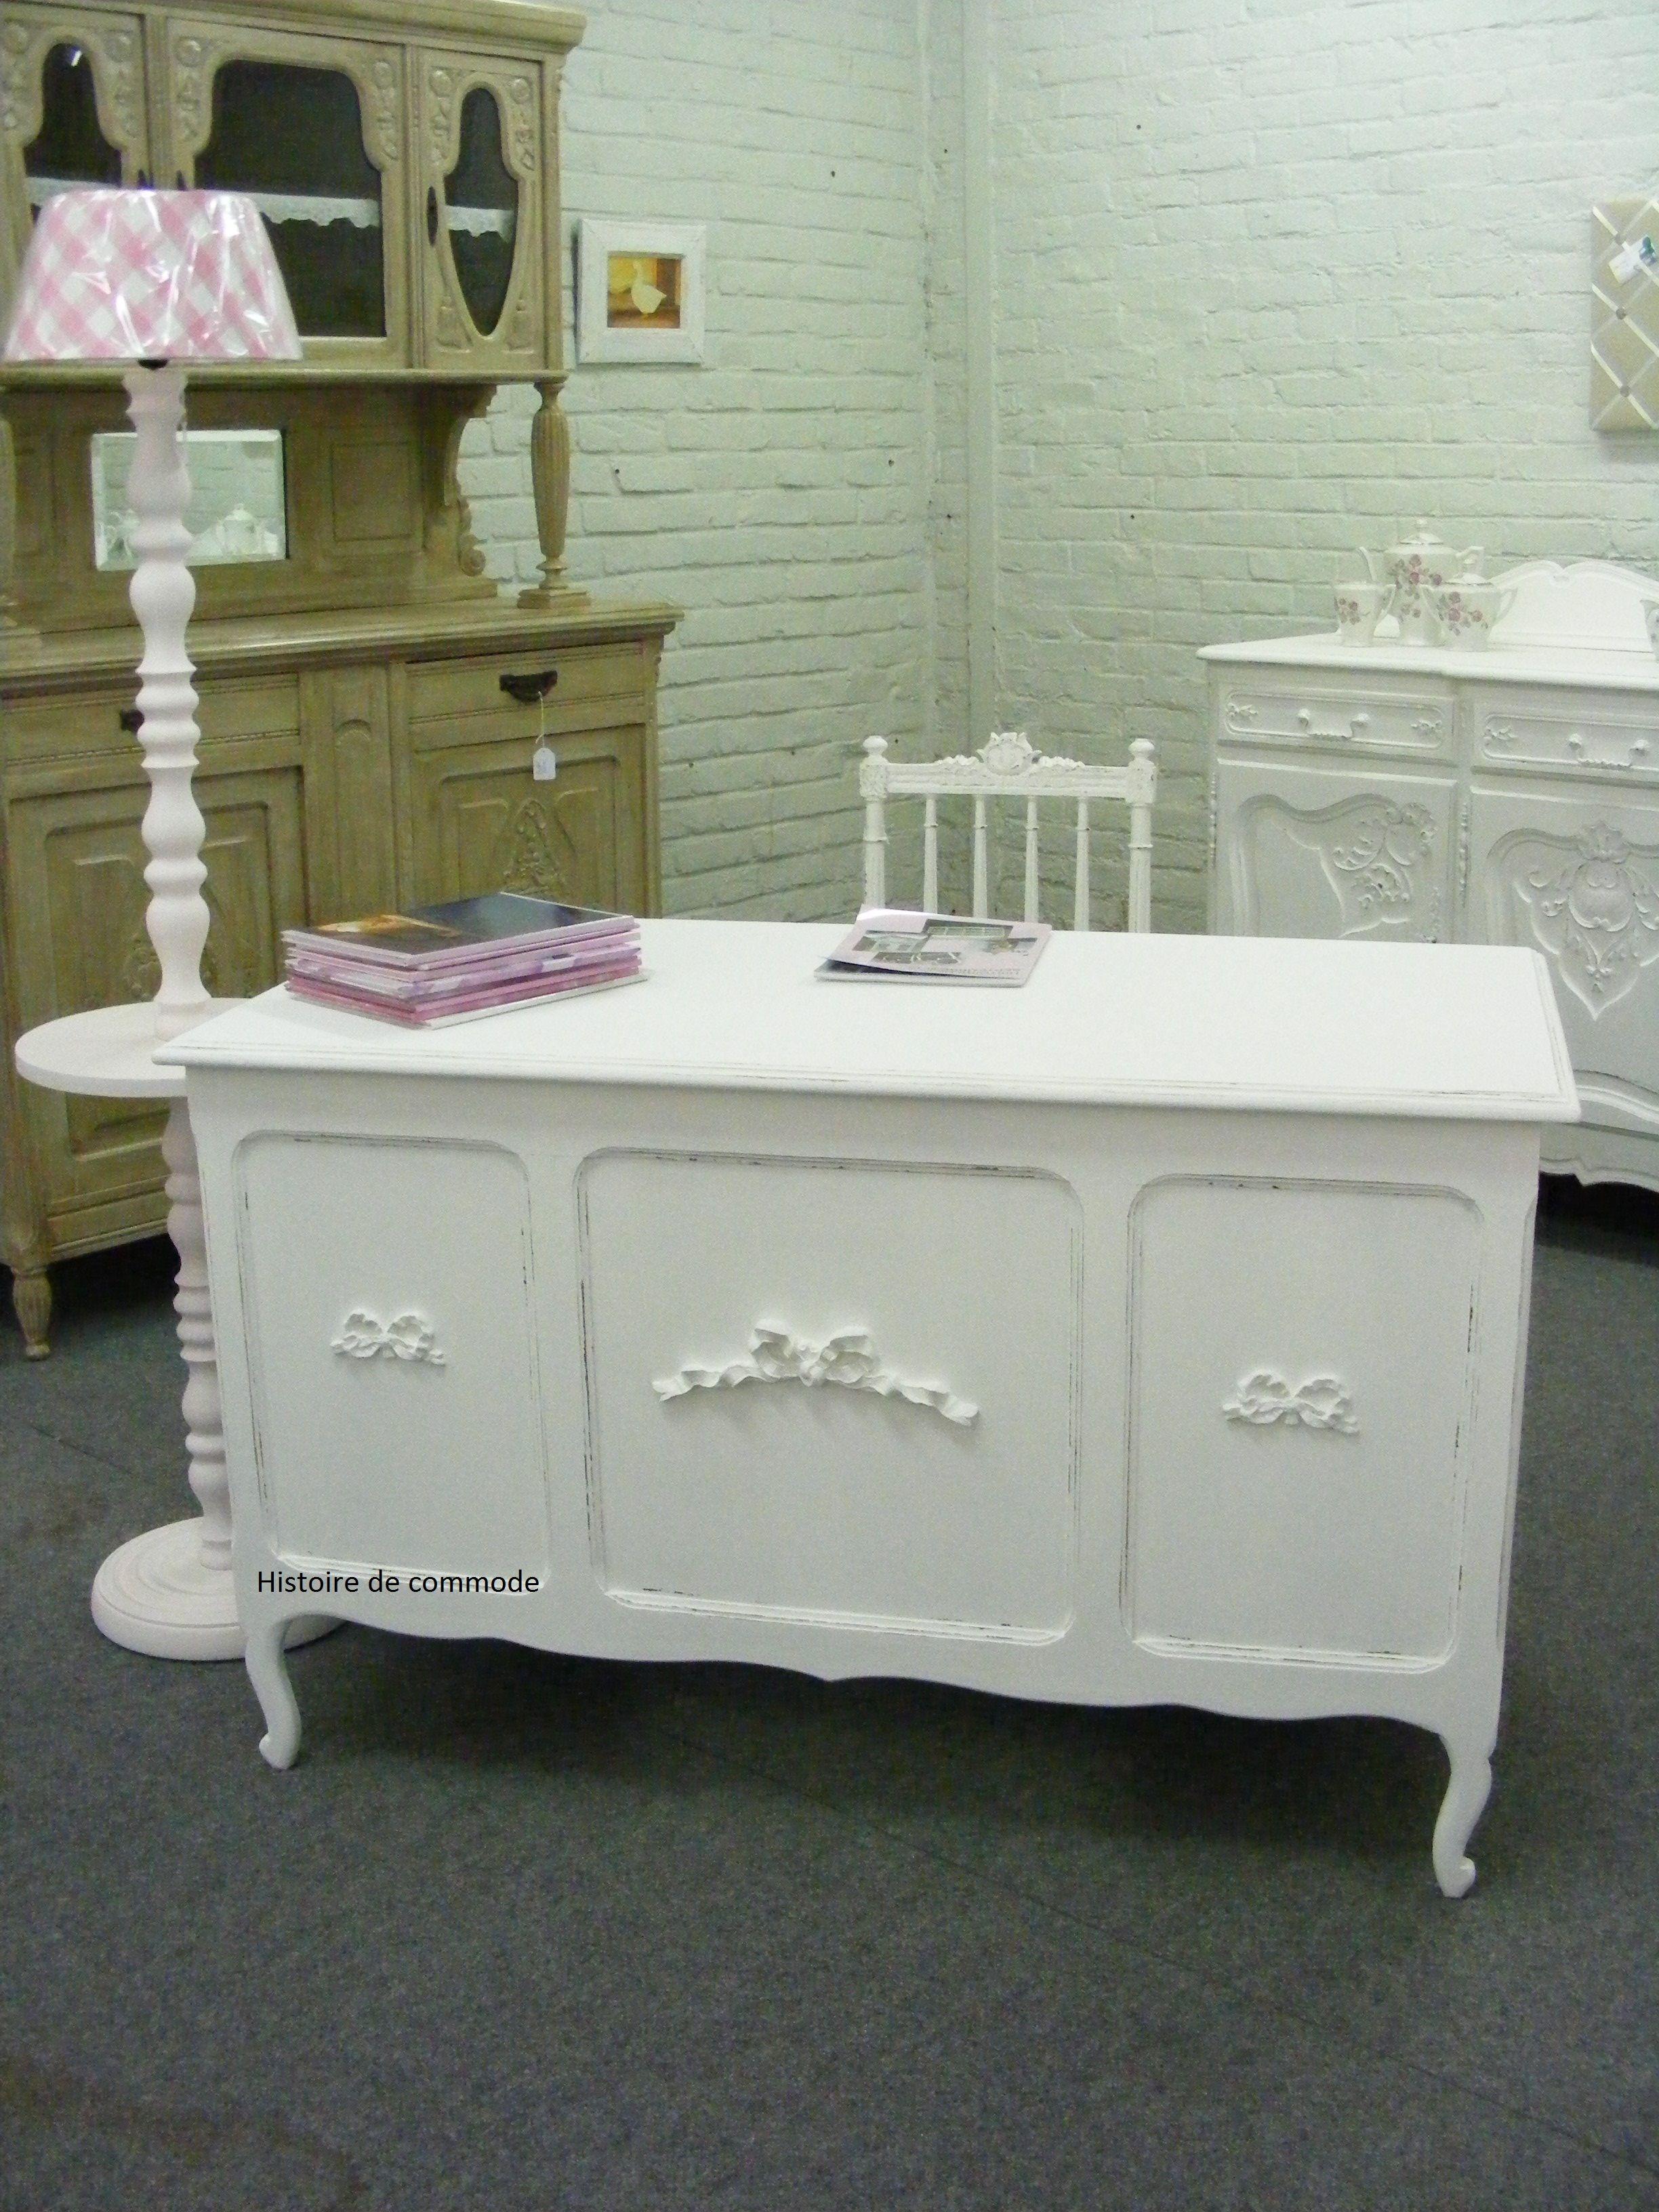 histoire de commode meubles patin s page 9. Black Bedroom Furniture Sets. Home Design Ideas